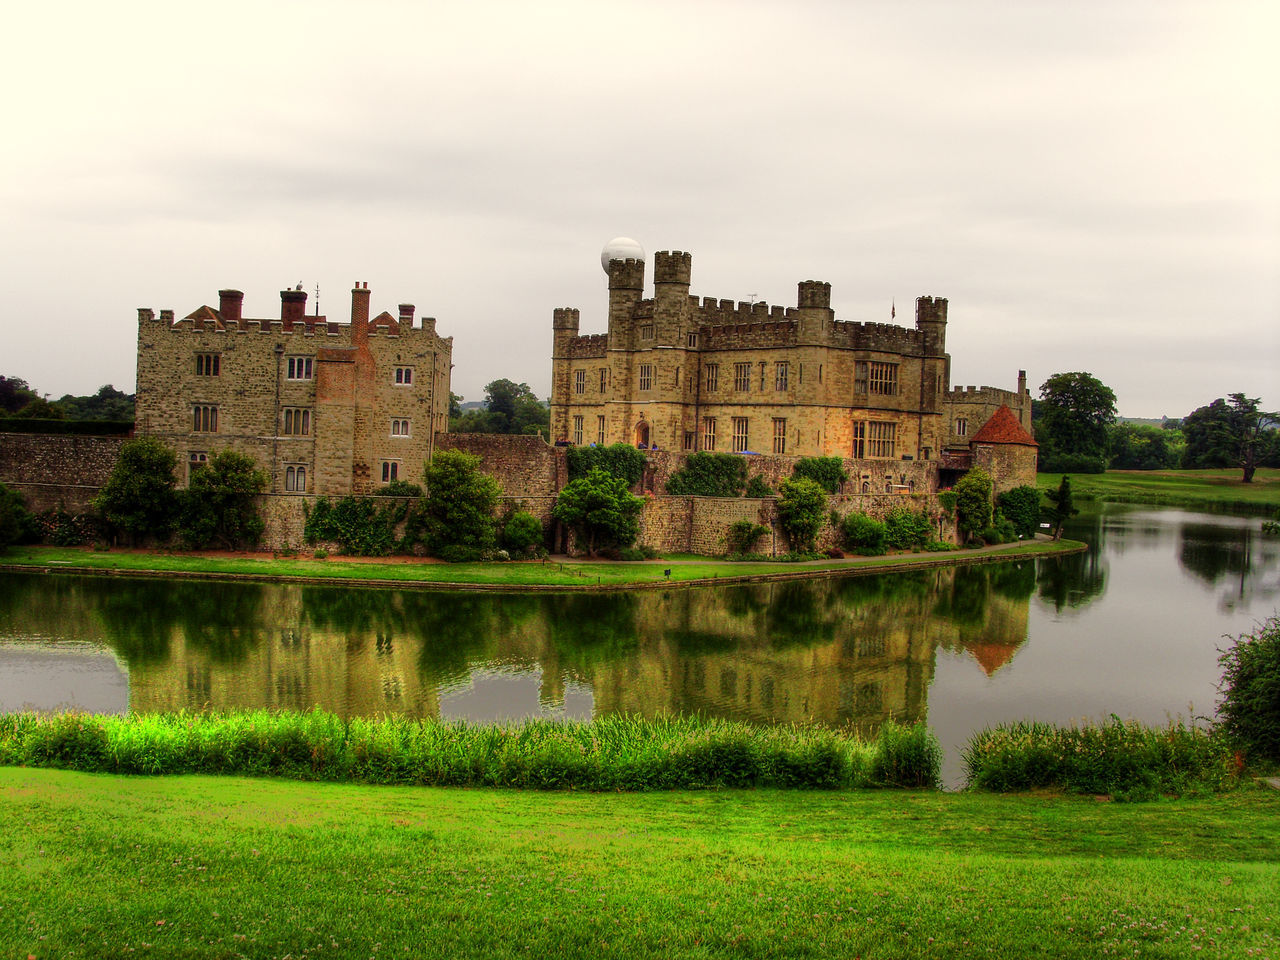 Black & White Castle English HDR Heritage Lake Leeds Castle Map Tone Scenery View